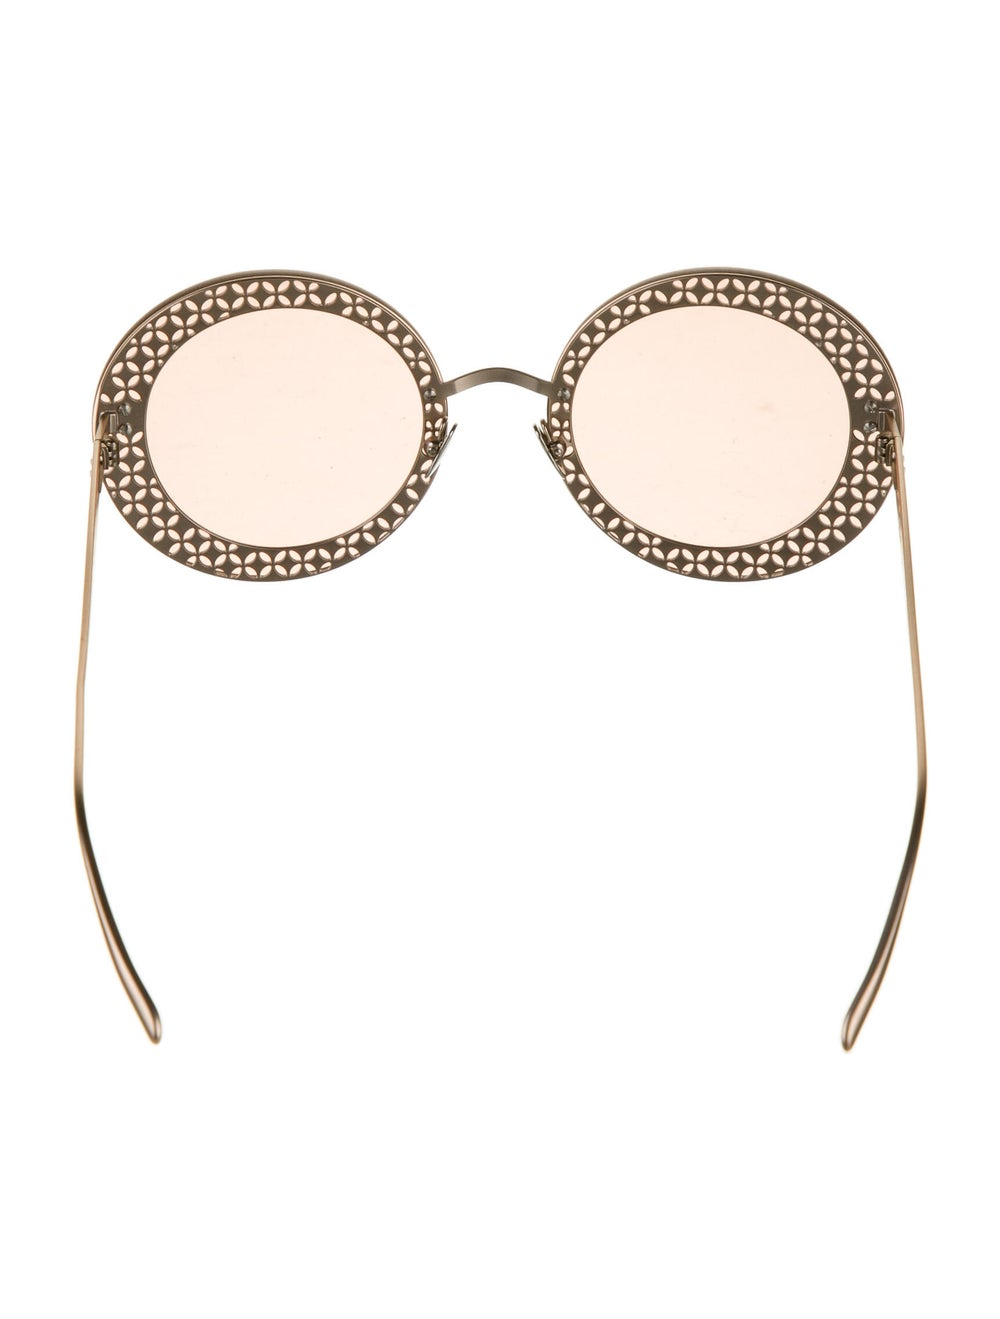 Alaïa Round Tinted Sunglasses - image 3